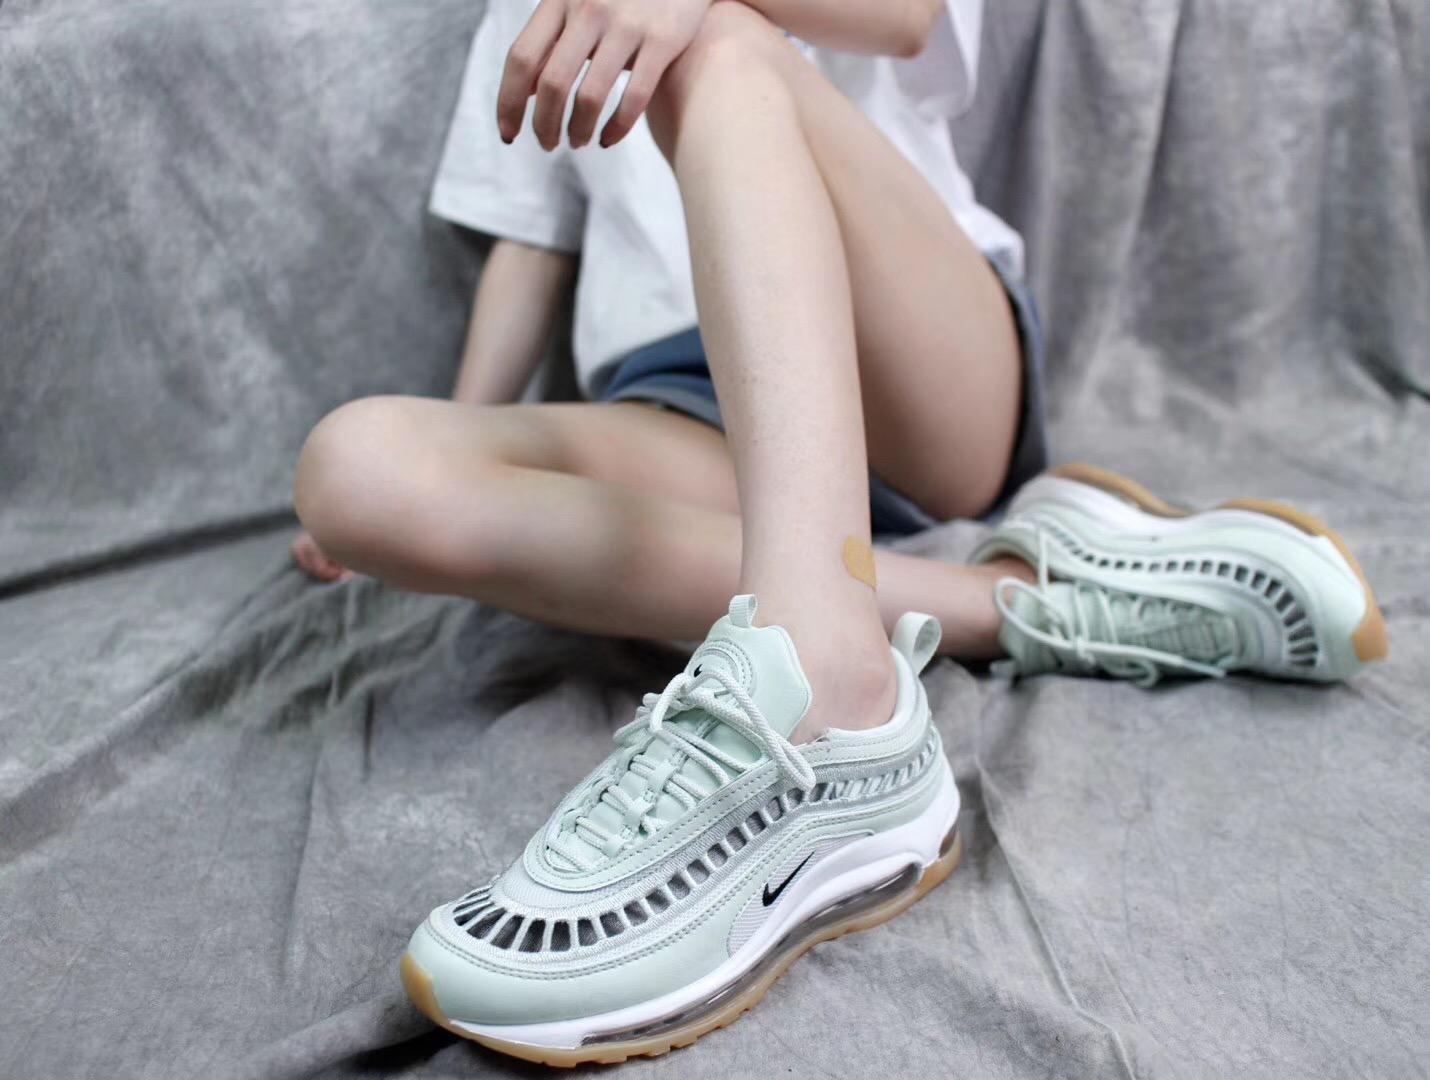 Giày Nike Air Max 97 UL 17